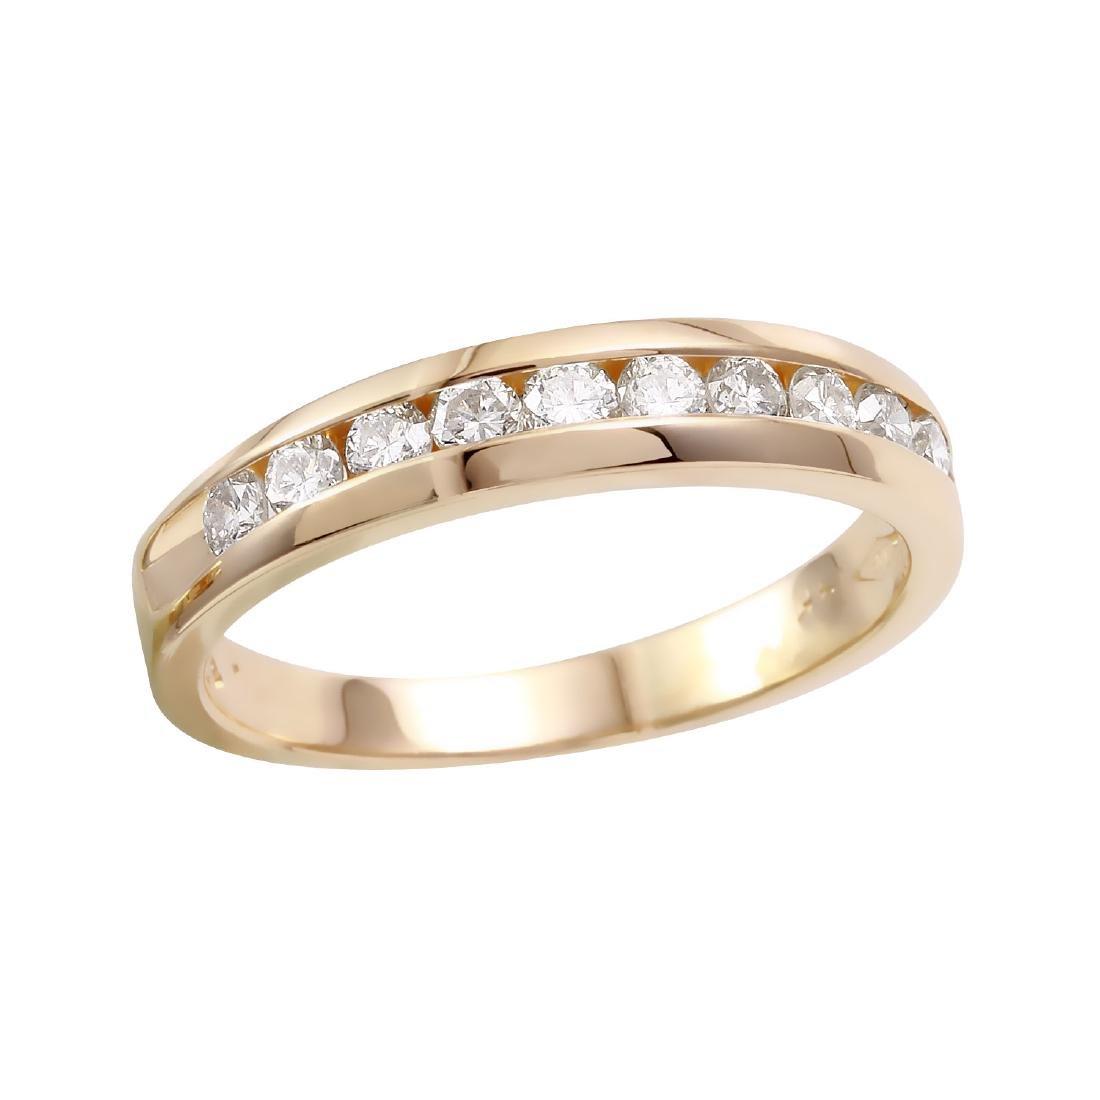 14KT Yellow Gold 0.45ctw Diamond Wedding Band Size 6.25 - 3